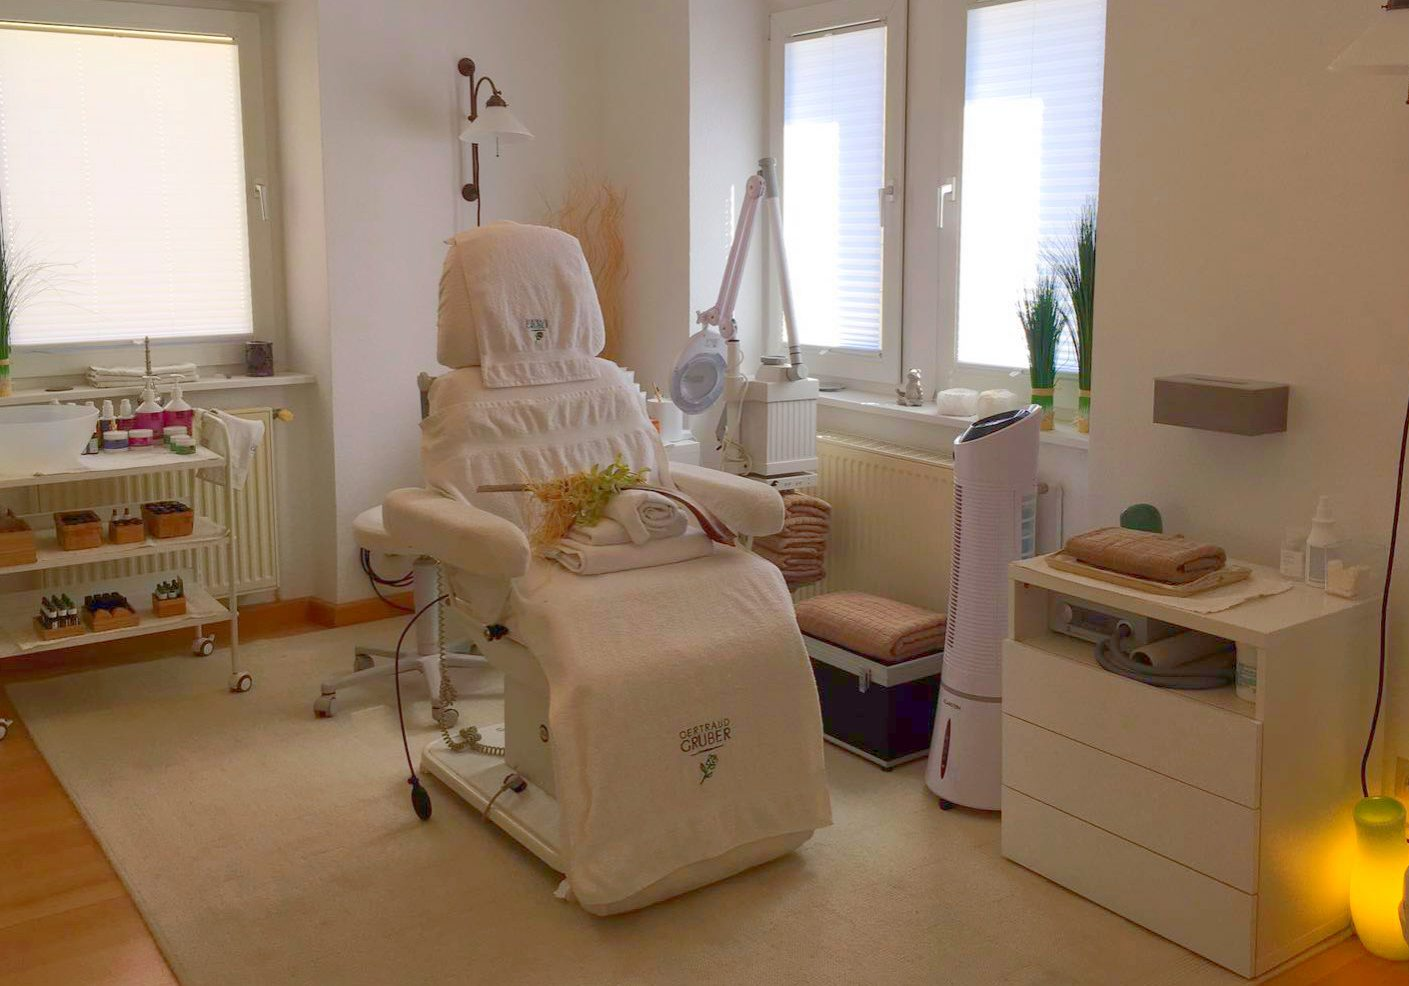 Kosmetikstudio Dorsch